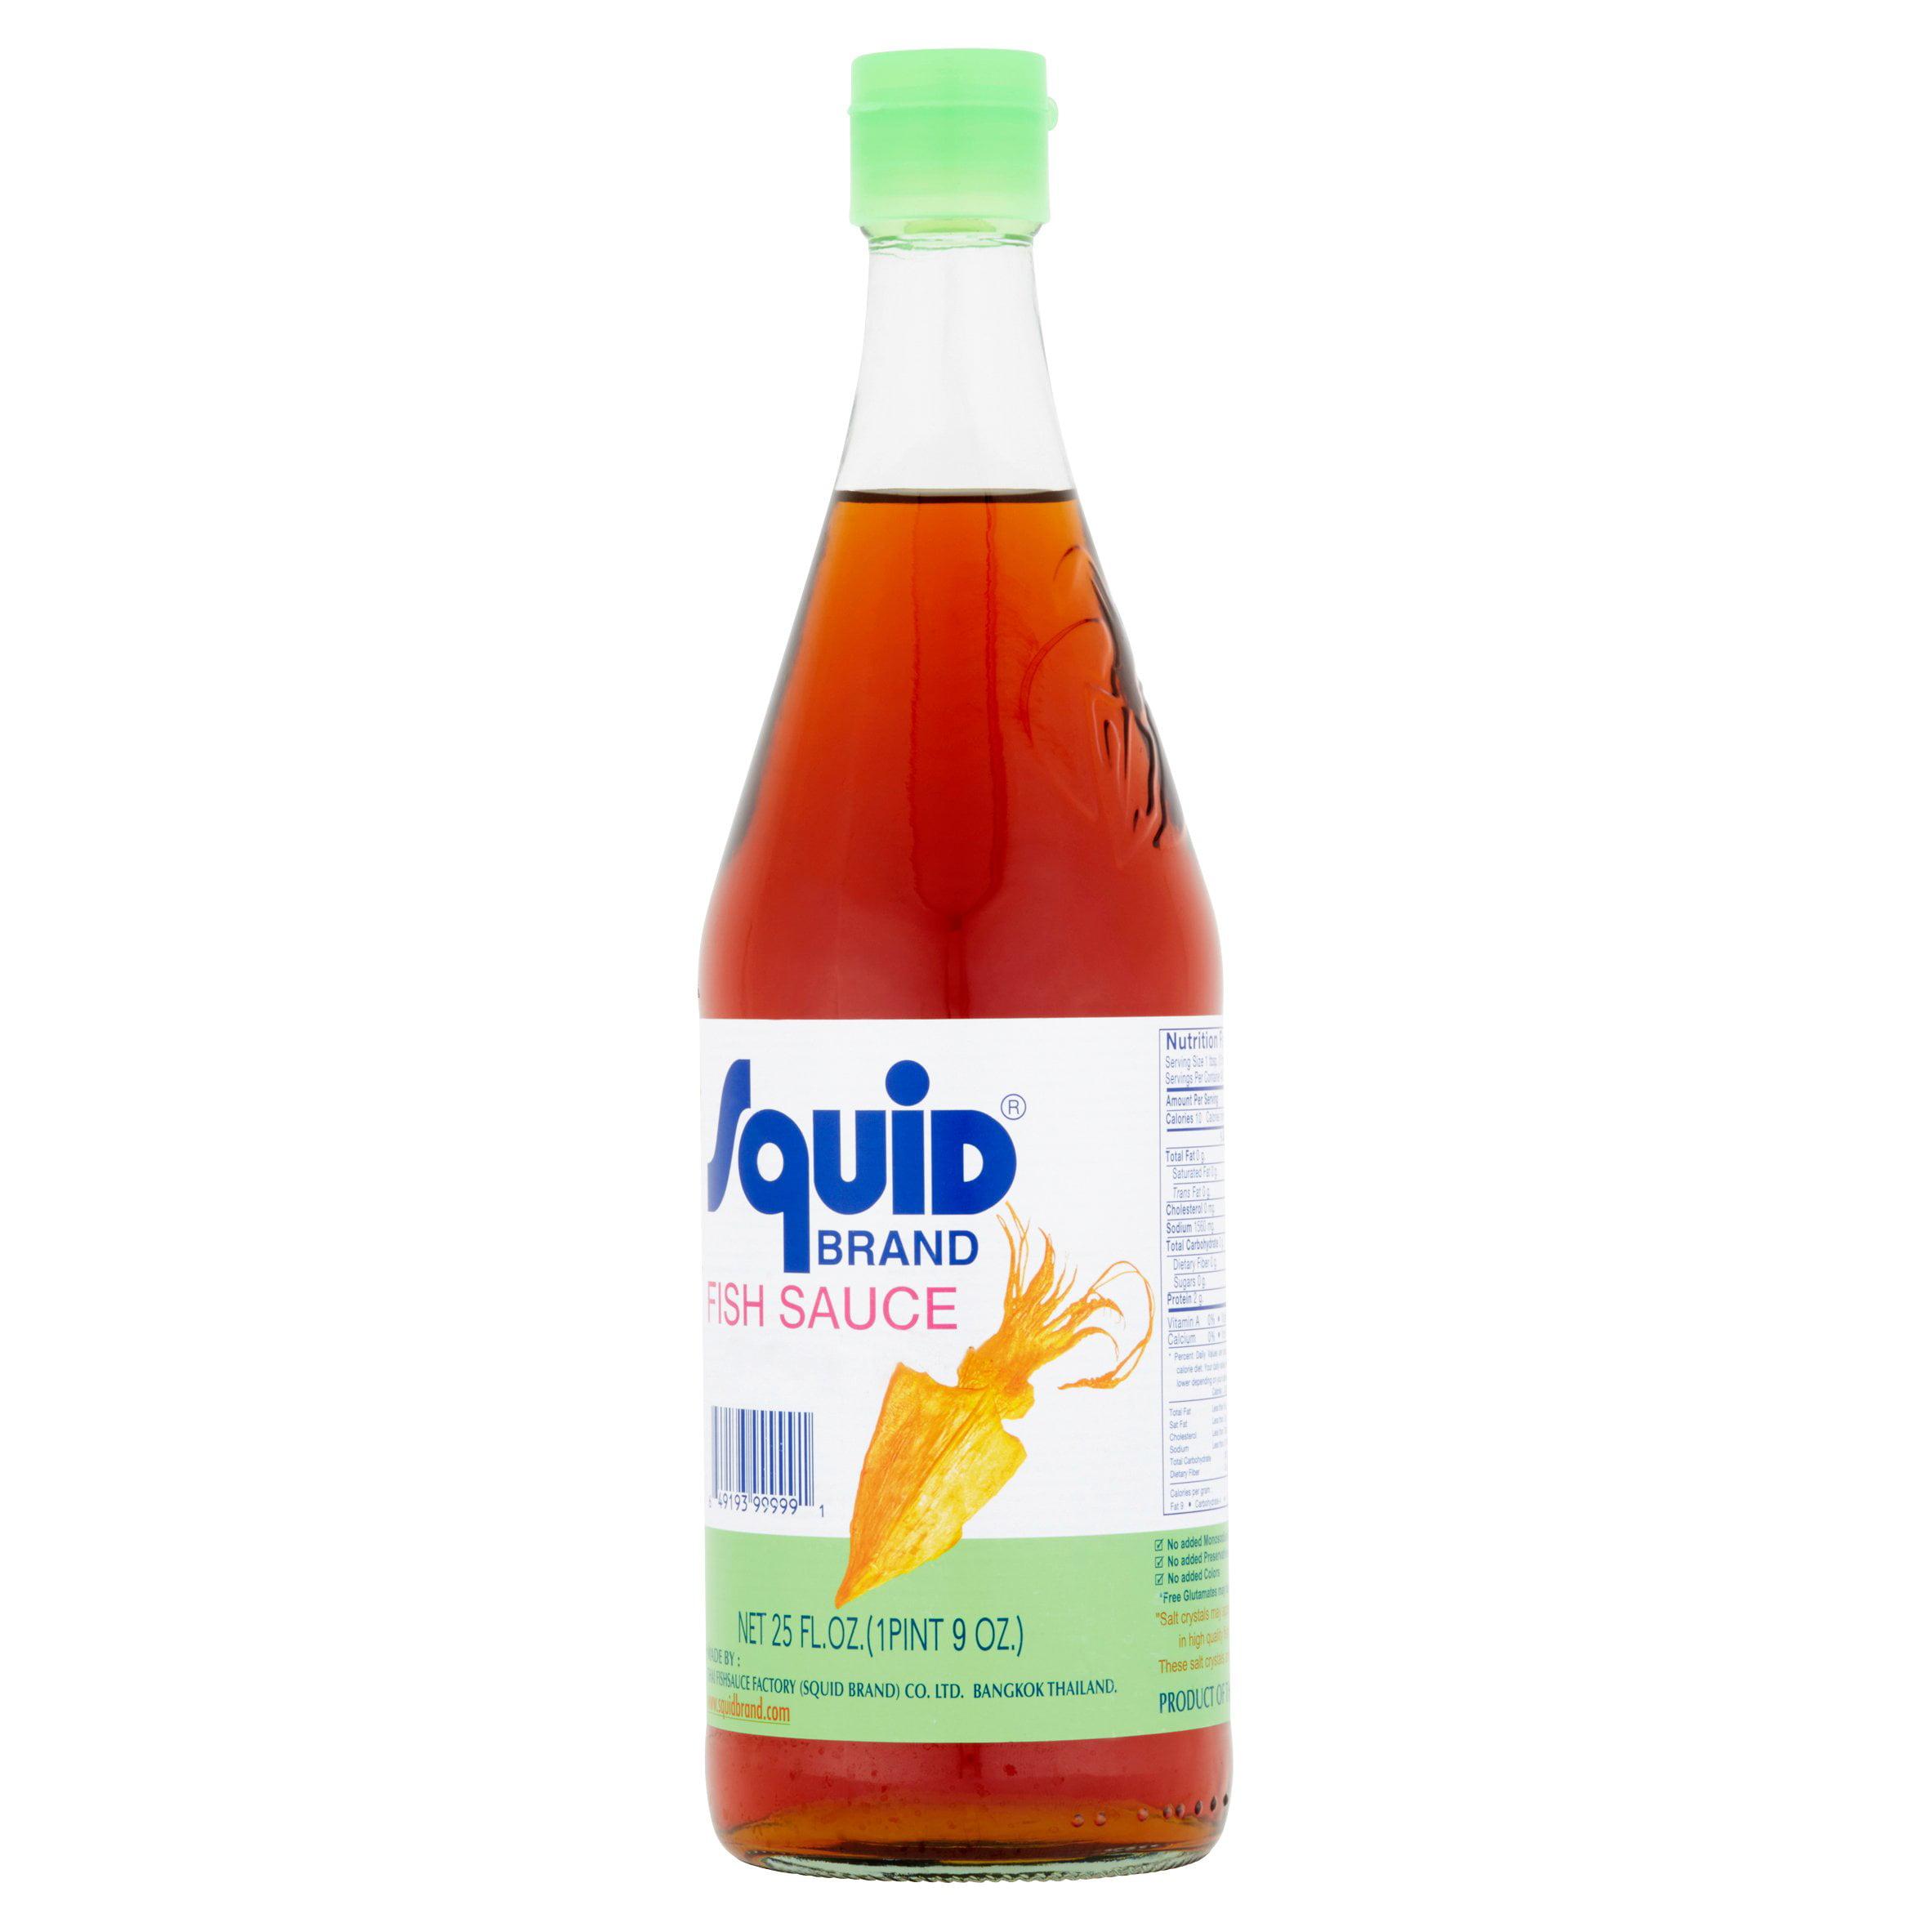 Squid Brand: Fish Sauce, 25 Fl Oz - Walmart.com